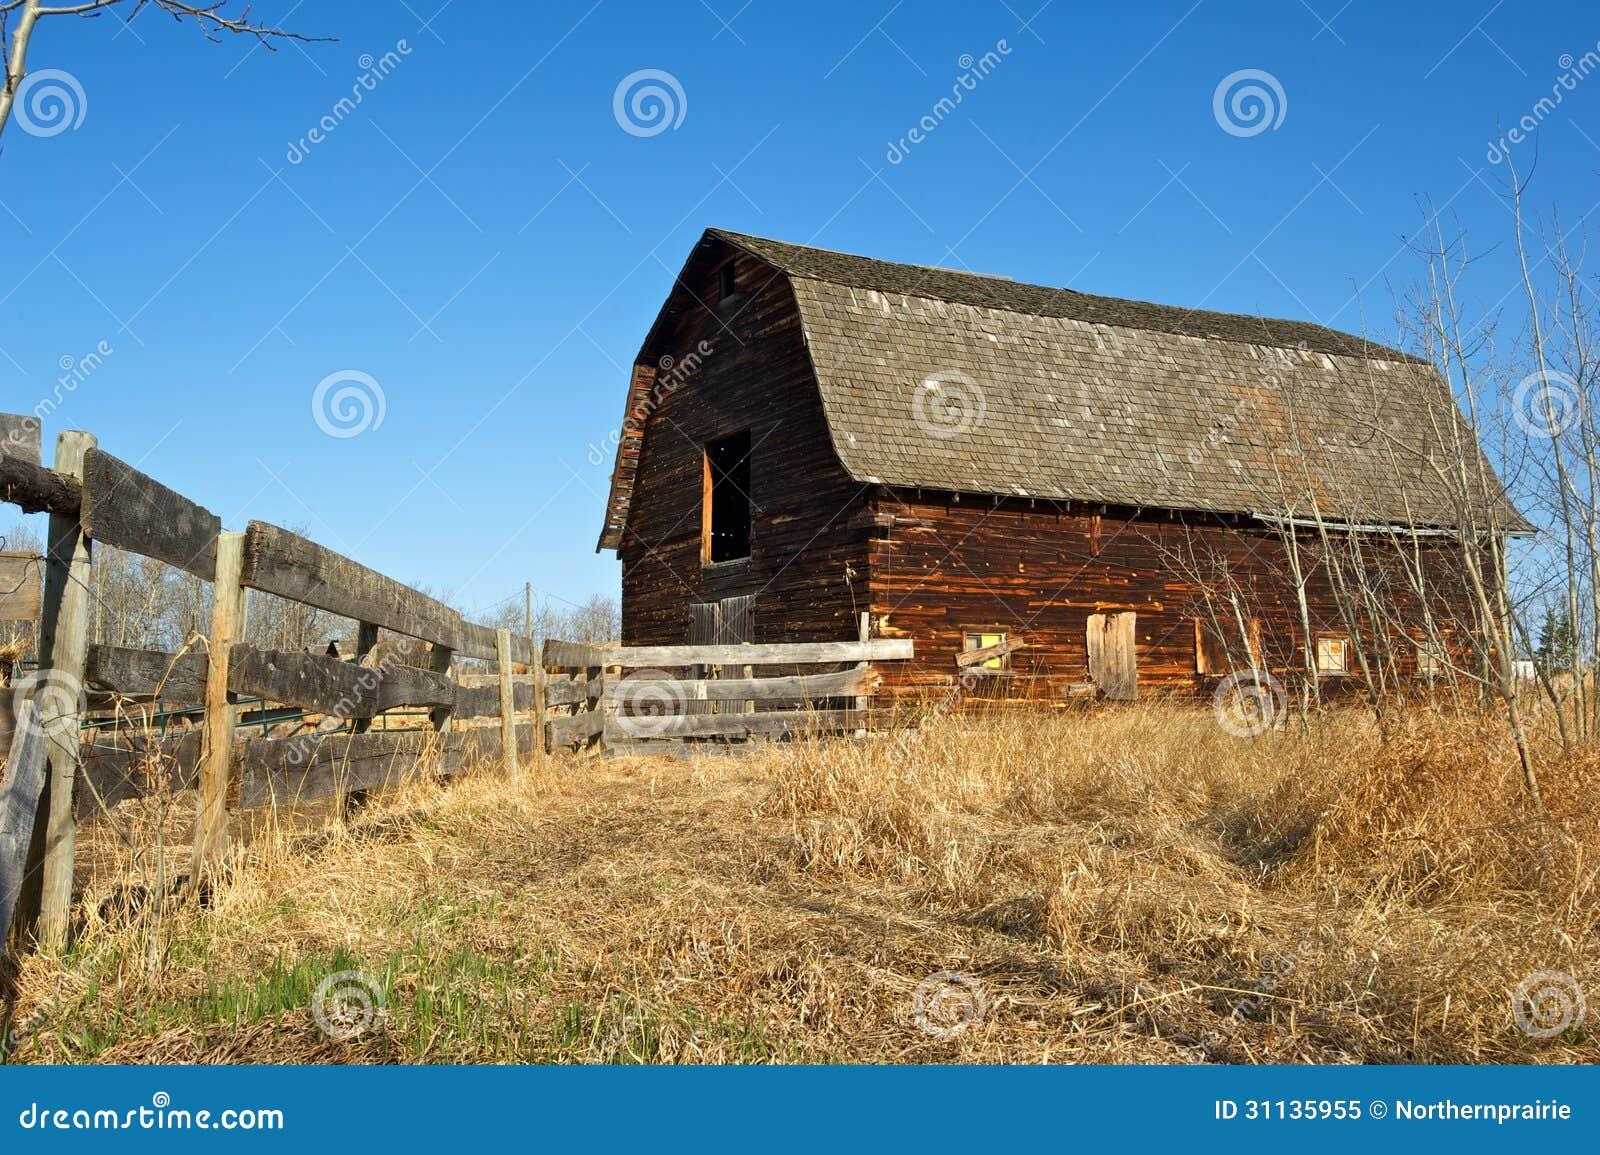 Vieille grange abandonn e et barri re en bois photo libre for Grange bois en kit